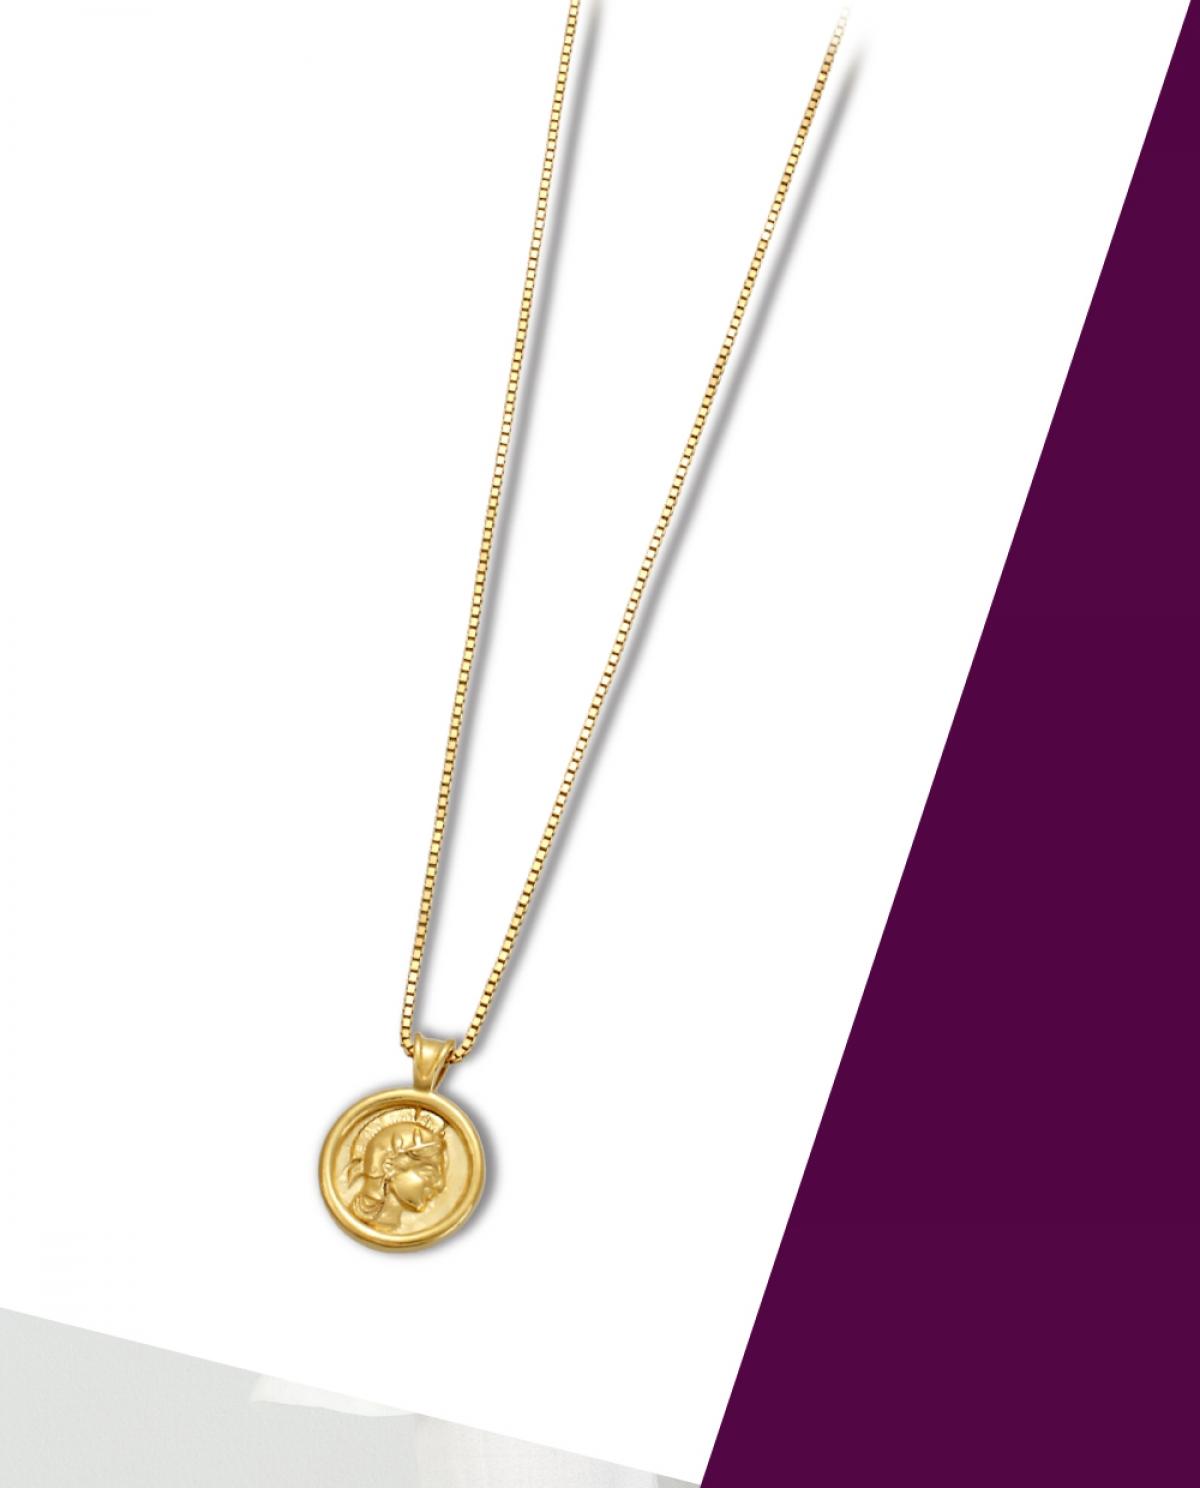 Athena's Coin Necklace